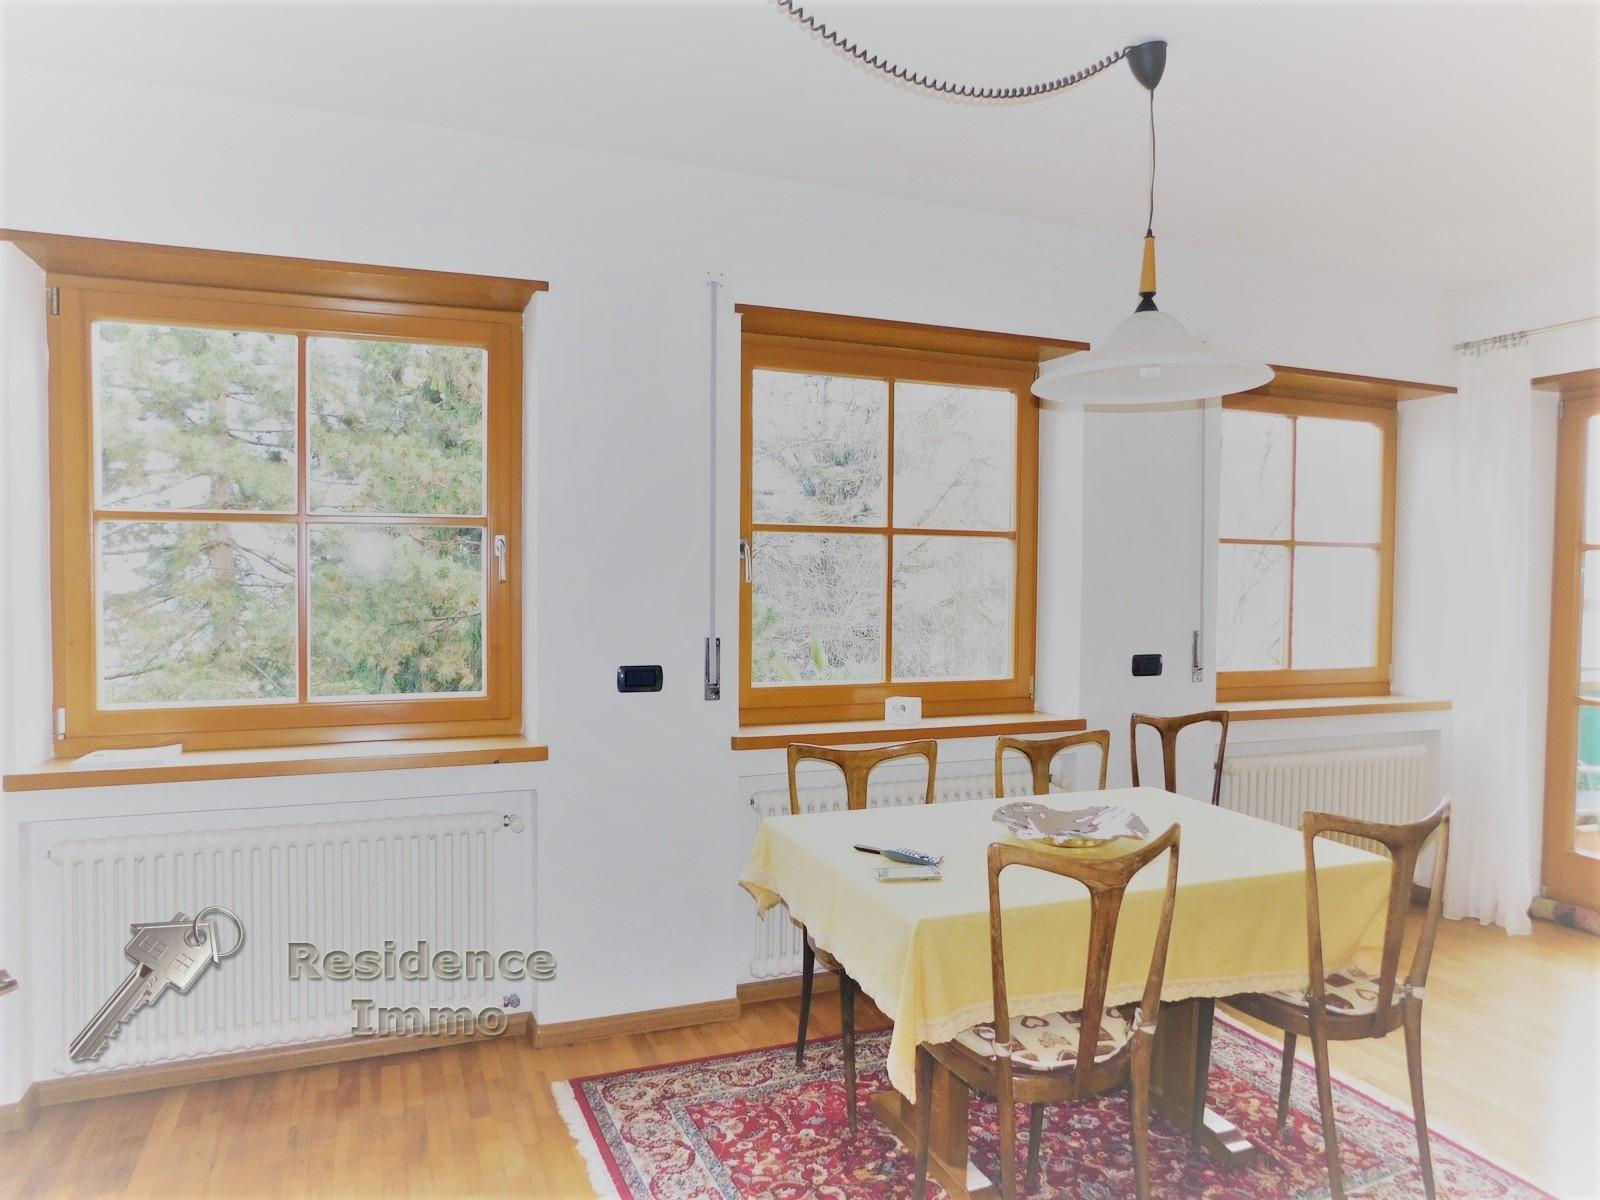 wohnung kaufen in nalles nals kodex 2225. Black Bedroom Furniture Sets. Home Design Ideas